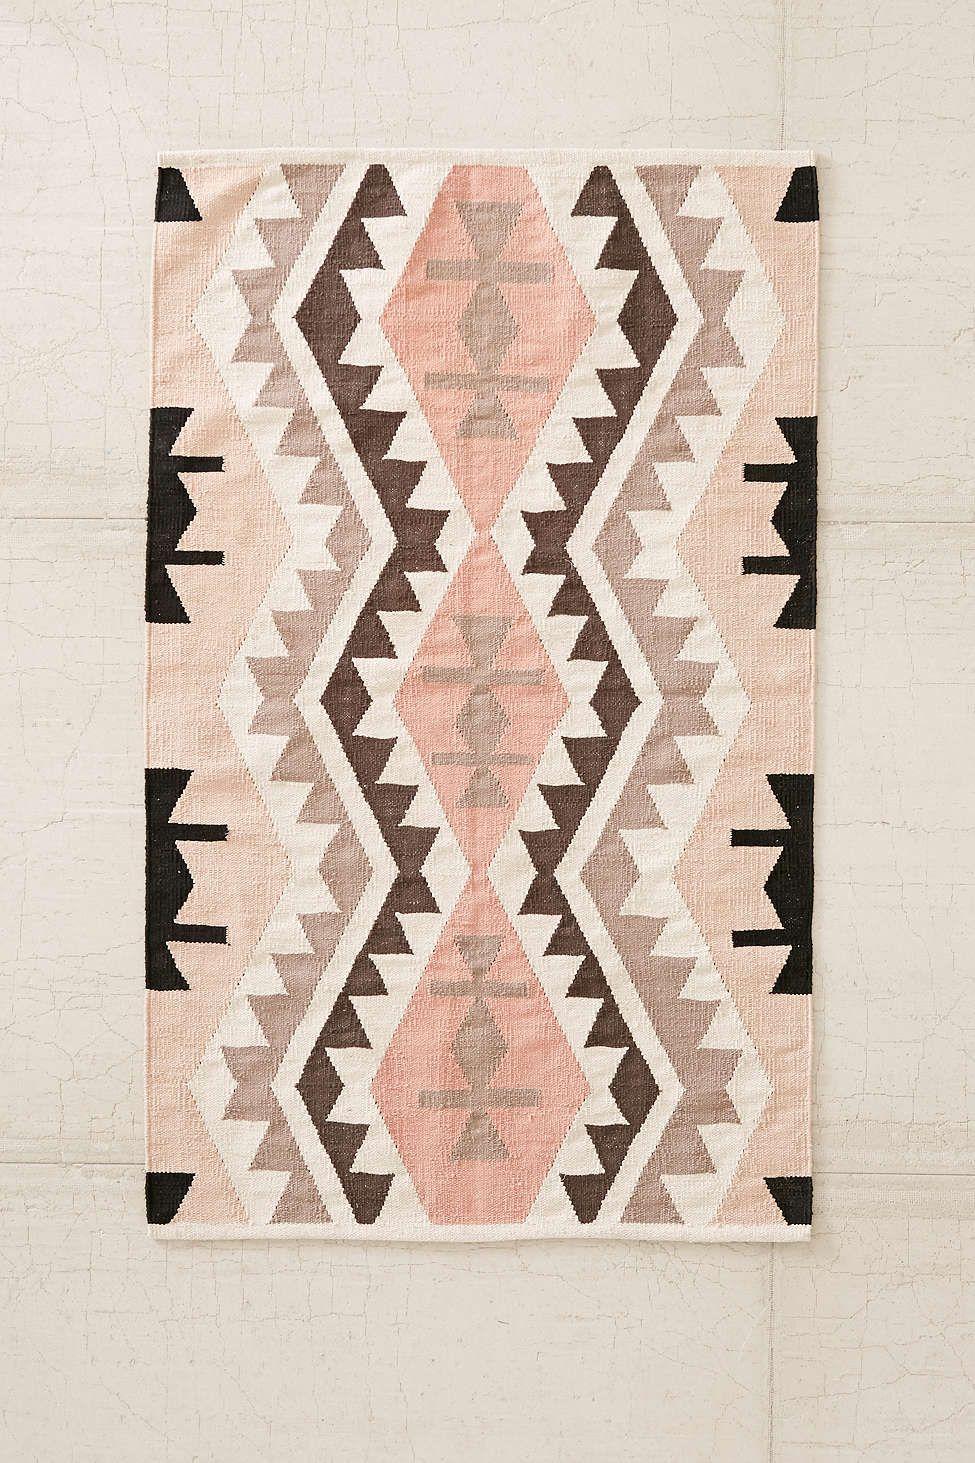 Plum & Bow Samarkand Kilm Rug  Urban Outfitters  #uohome Inspiration Southwestern Bathroom Rugs Design Inspiration